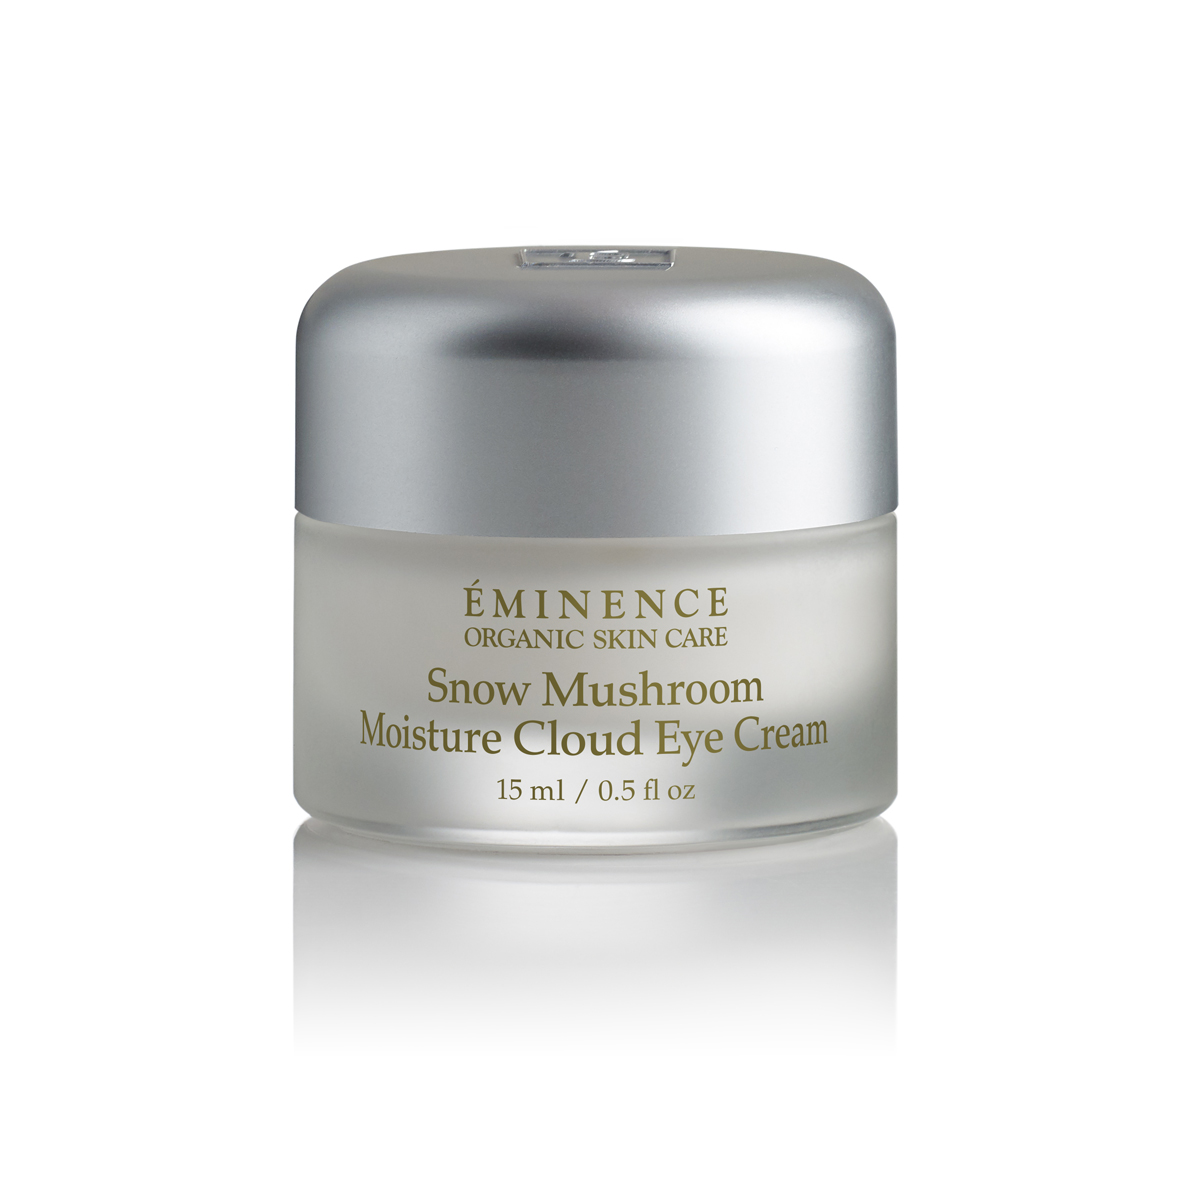 Snow Mushroom Moisture Cloud Eye Cream 15ml